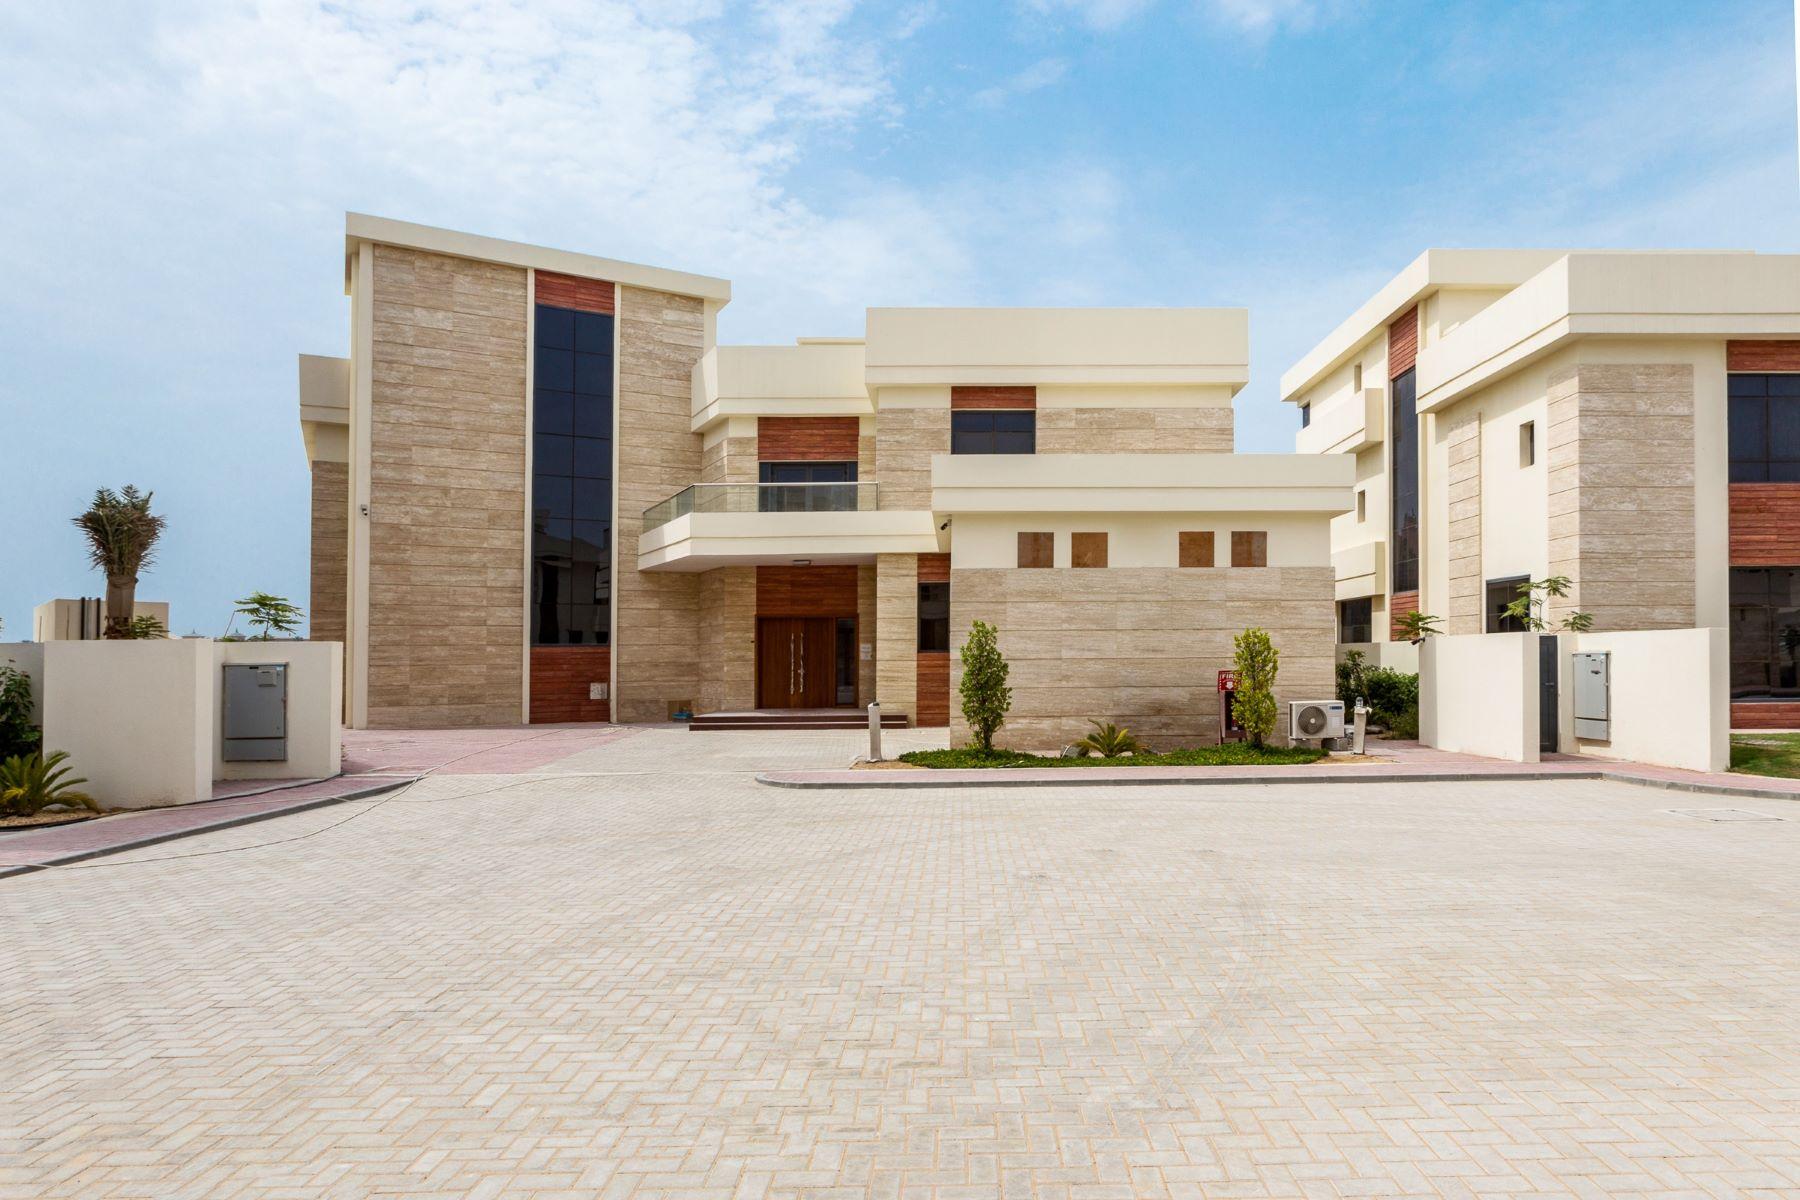 Additional photo for property listing at VIP Frond  4 Luxury Villas Tip Location Dubai, Dubaï Émirats Arabes Unis